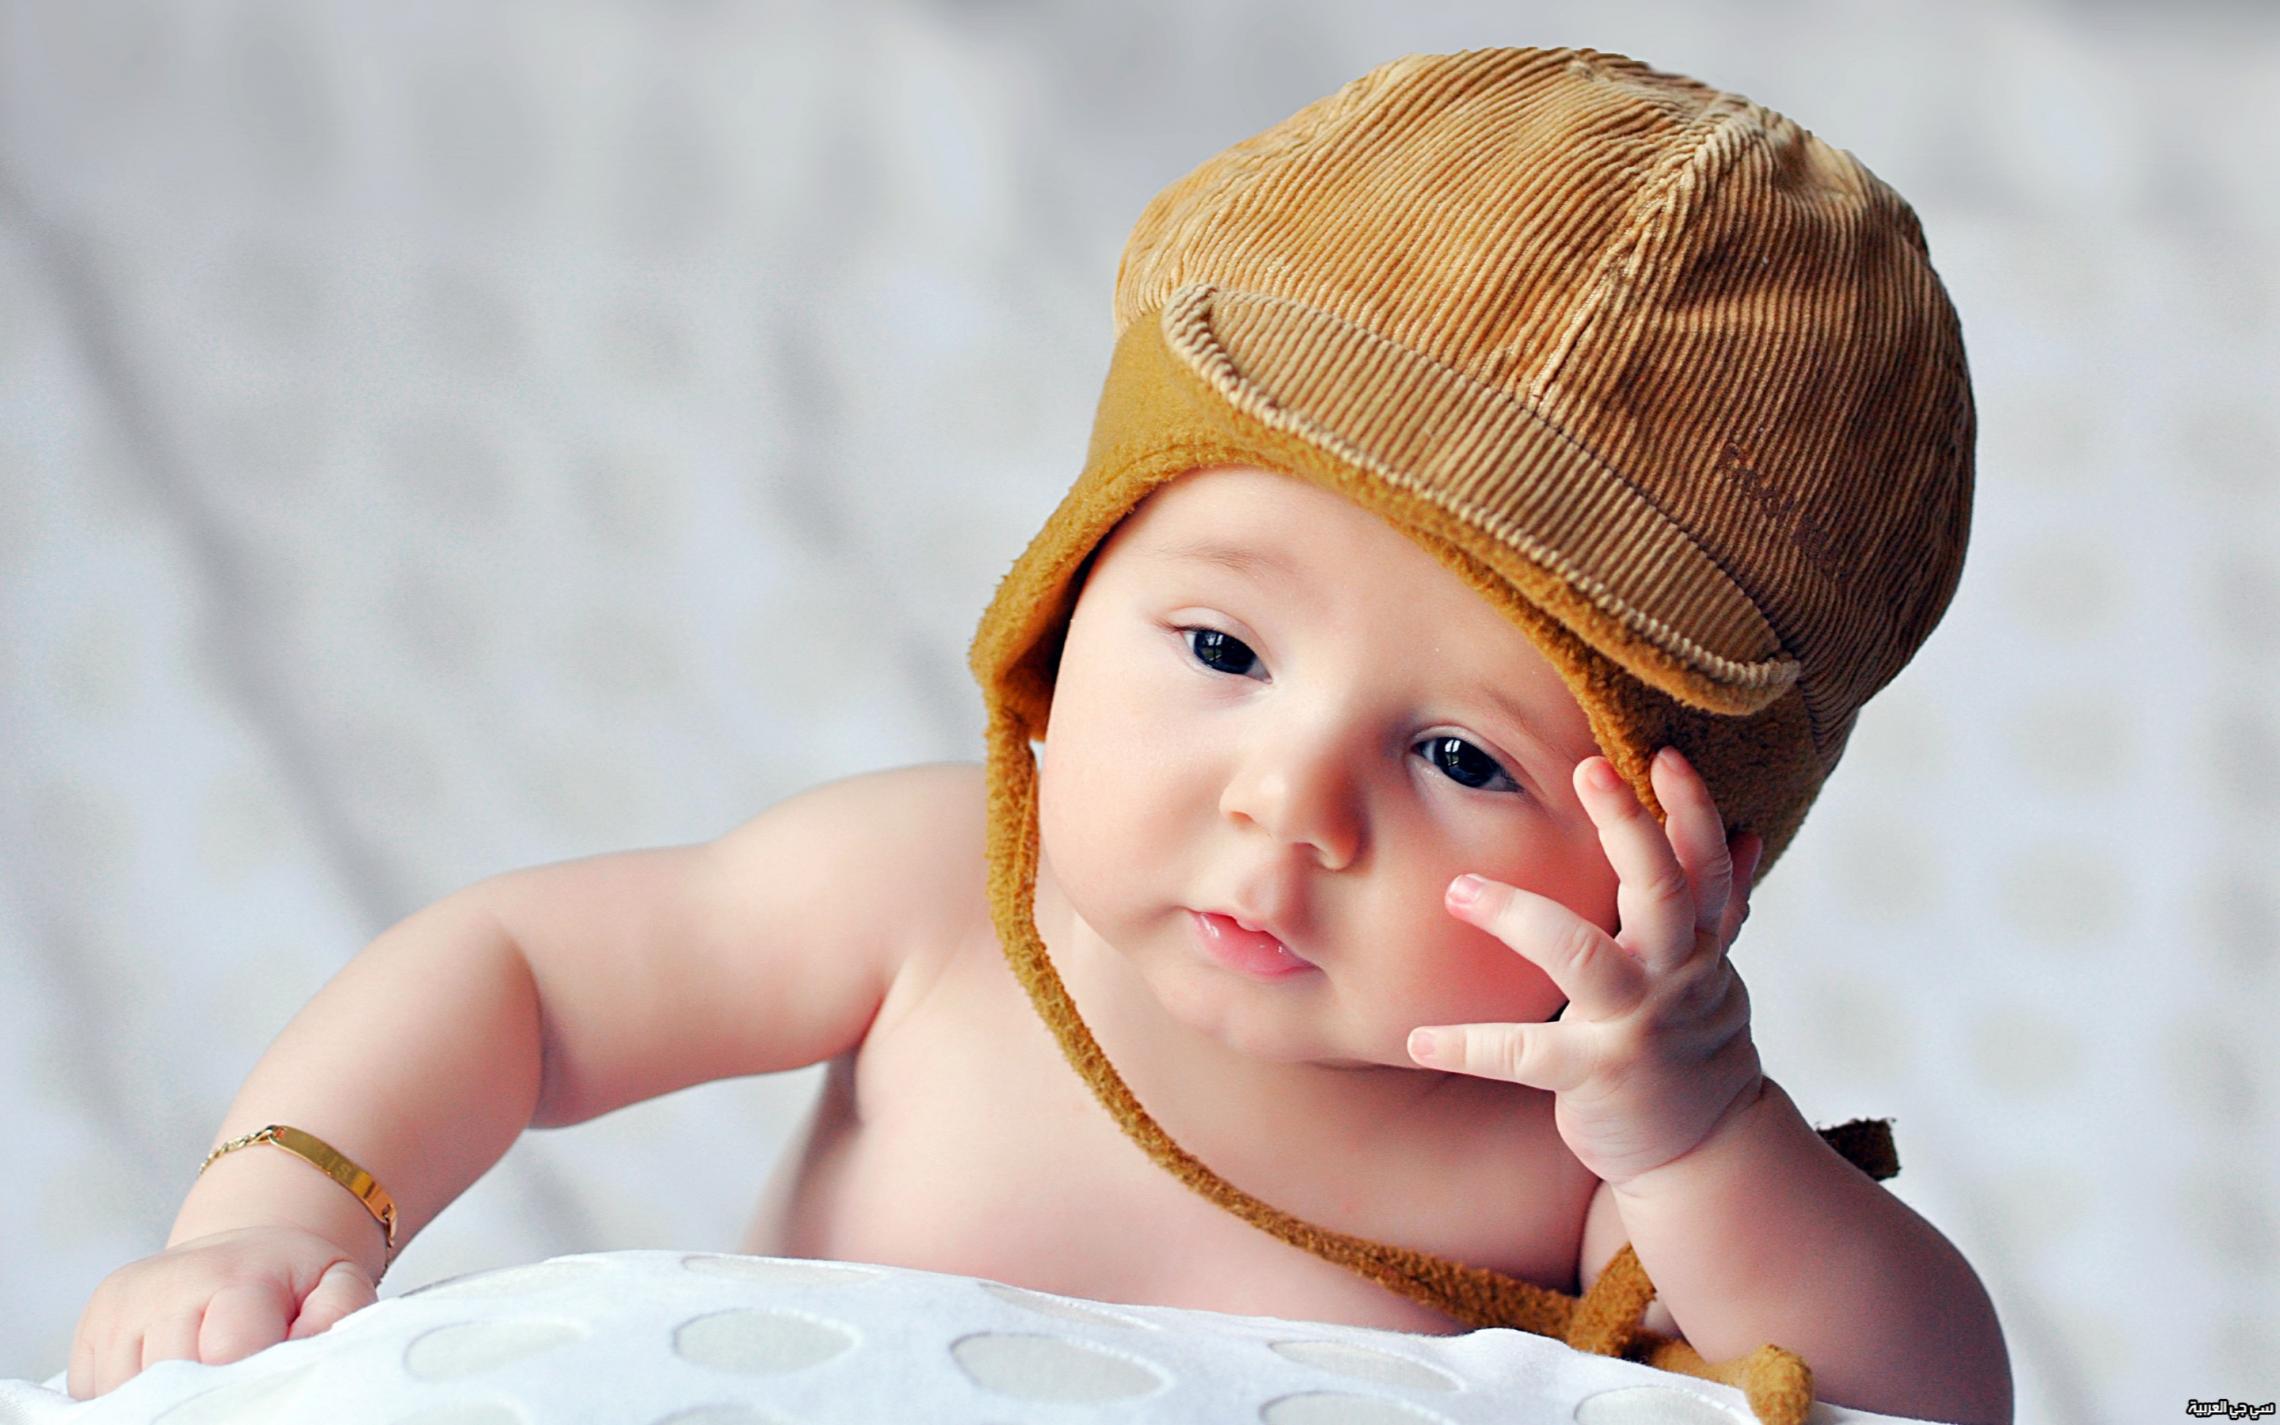 صور اطفال صور بيبي صور اولاد صور حلوين اطفال حلوينصور اطفال صغار2020 51